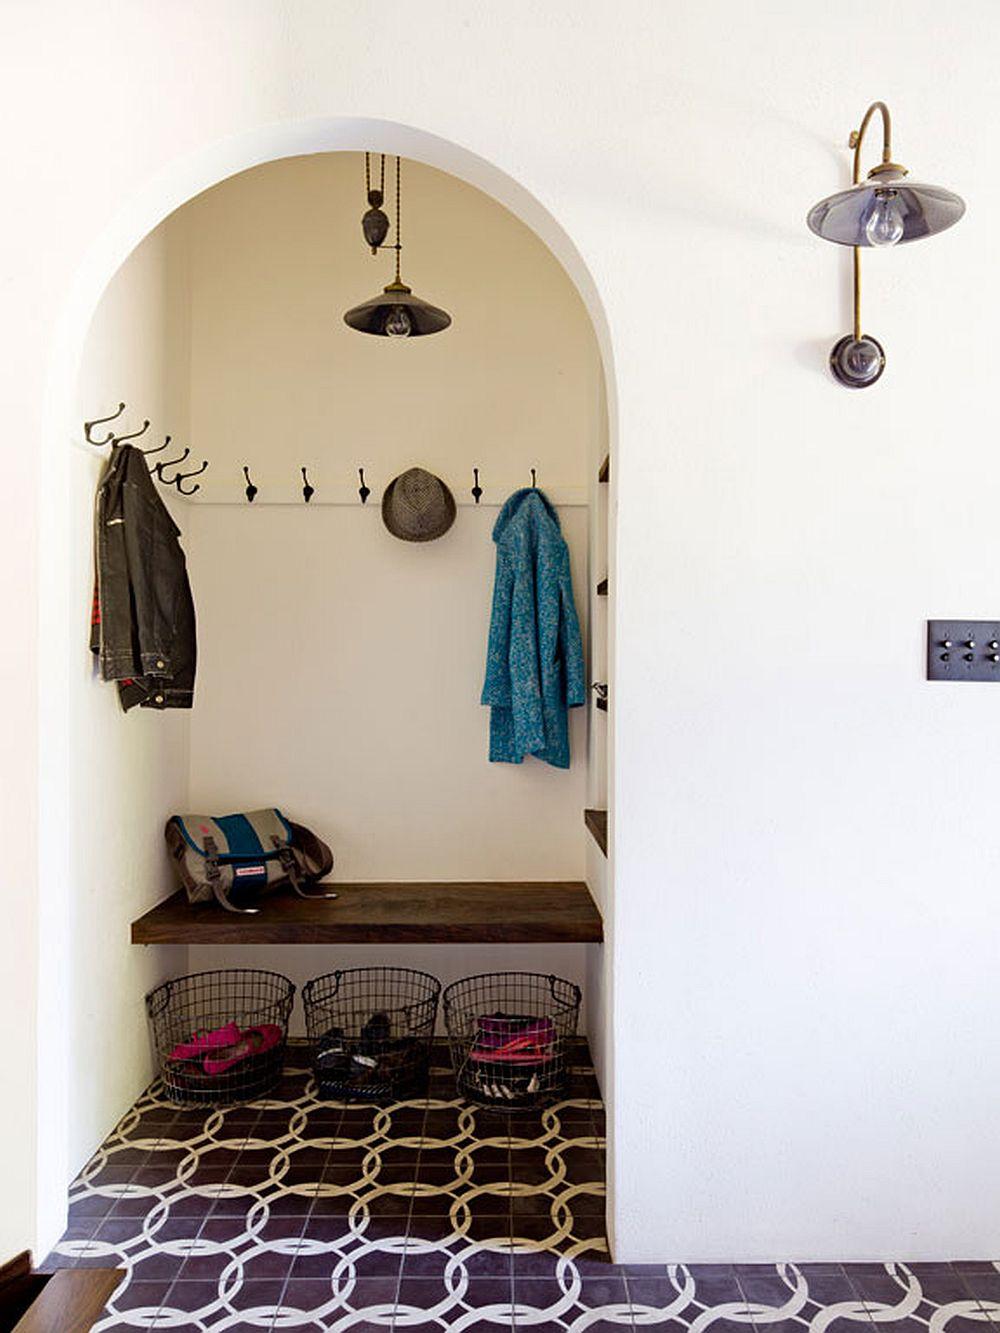 adelaparvu.com despre casa in stil mediteranean cu obiecte marocane, designer Jessica Helgerson, foto  Lincoln Barbour (1)